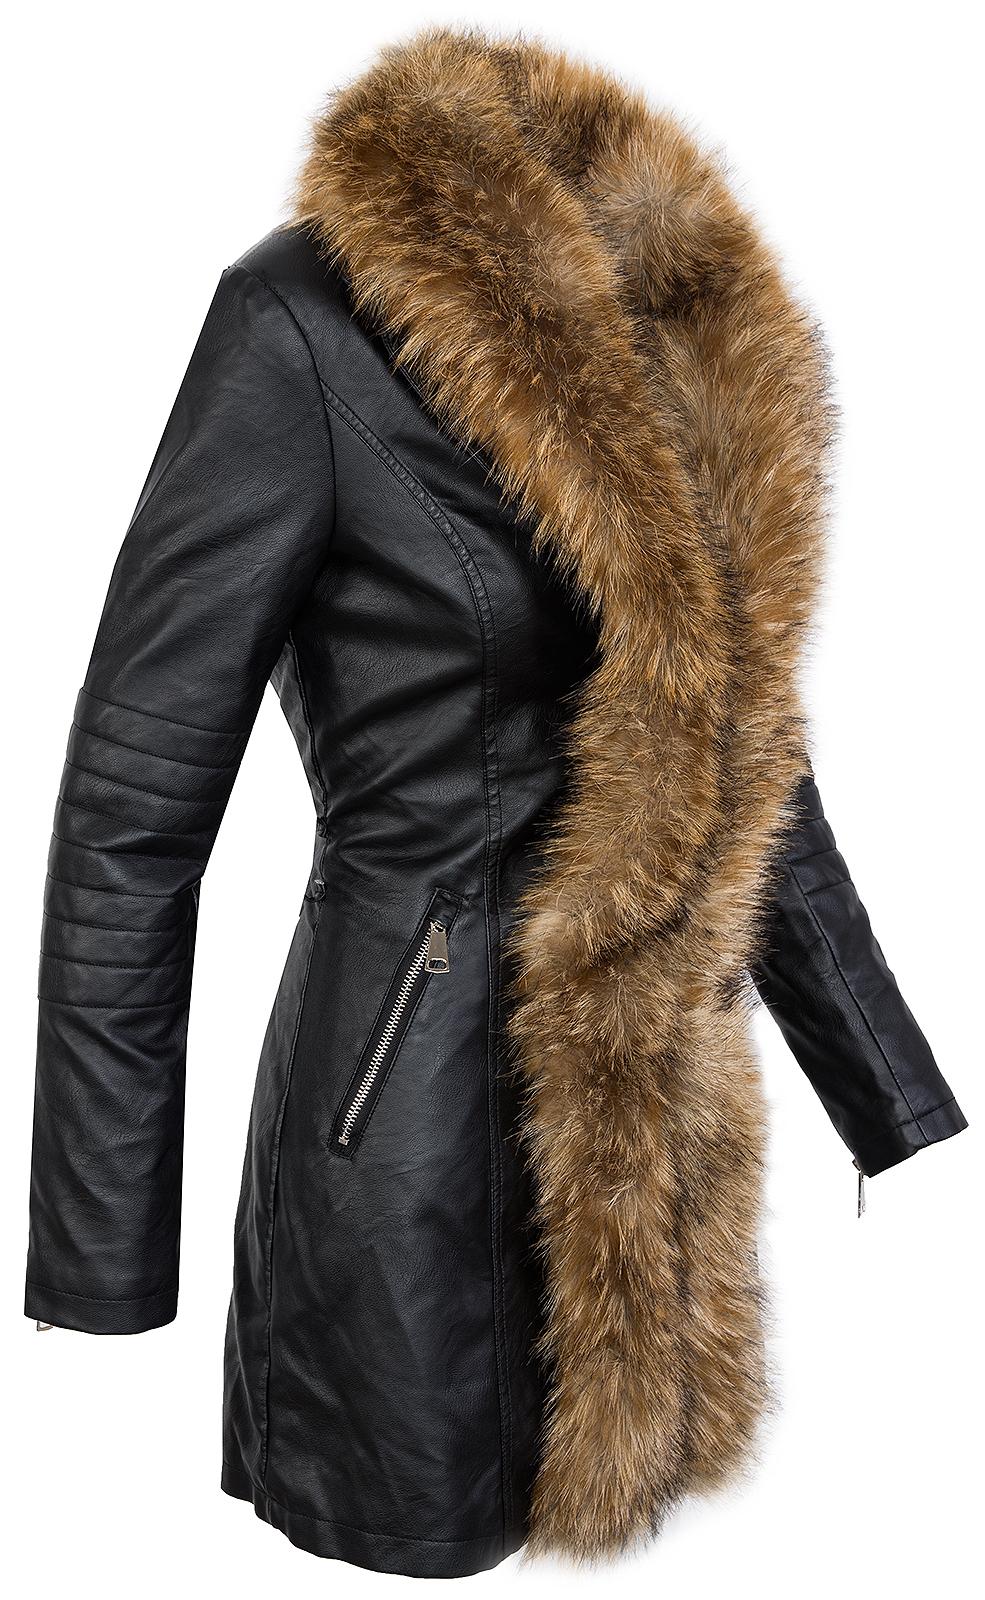 damen kunstleder jacke mantel warm lederoptik bergangsjacke fellkragen d 249 ebay. Black Bedroom Furniture Sets. Home Design Ideas